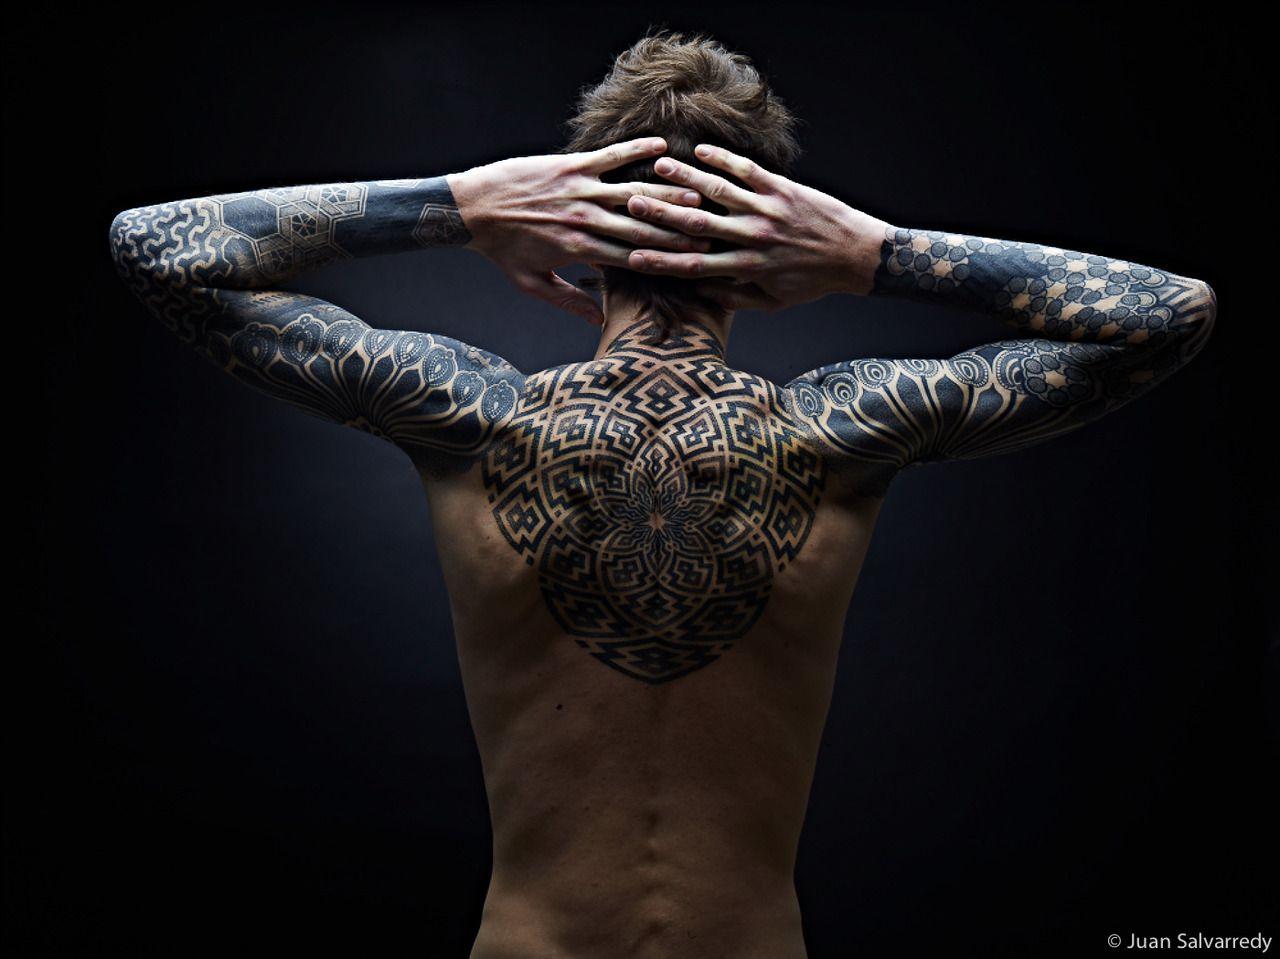 Pin 25 overwhelming rib tattoos for guys creativefan on pinterest - Http 25 Media Tumblr Com Tumblr_mcl57jya8w1qf1gzno2_1280 Jpg Tattoo Designs